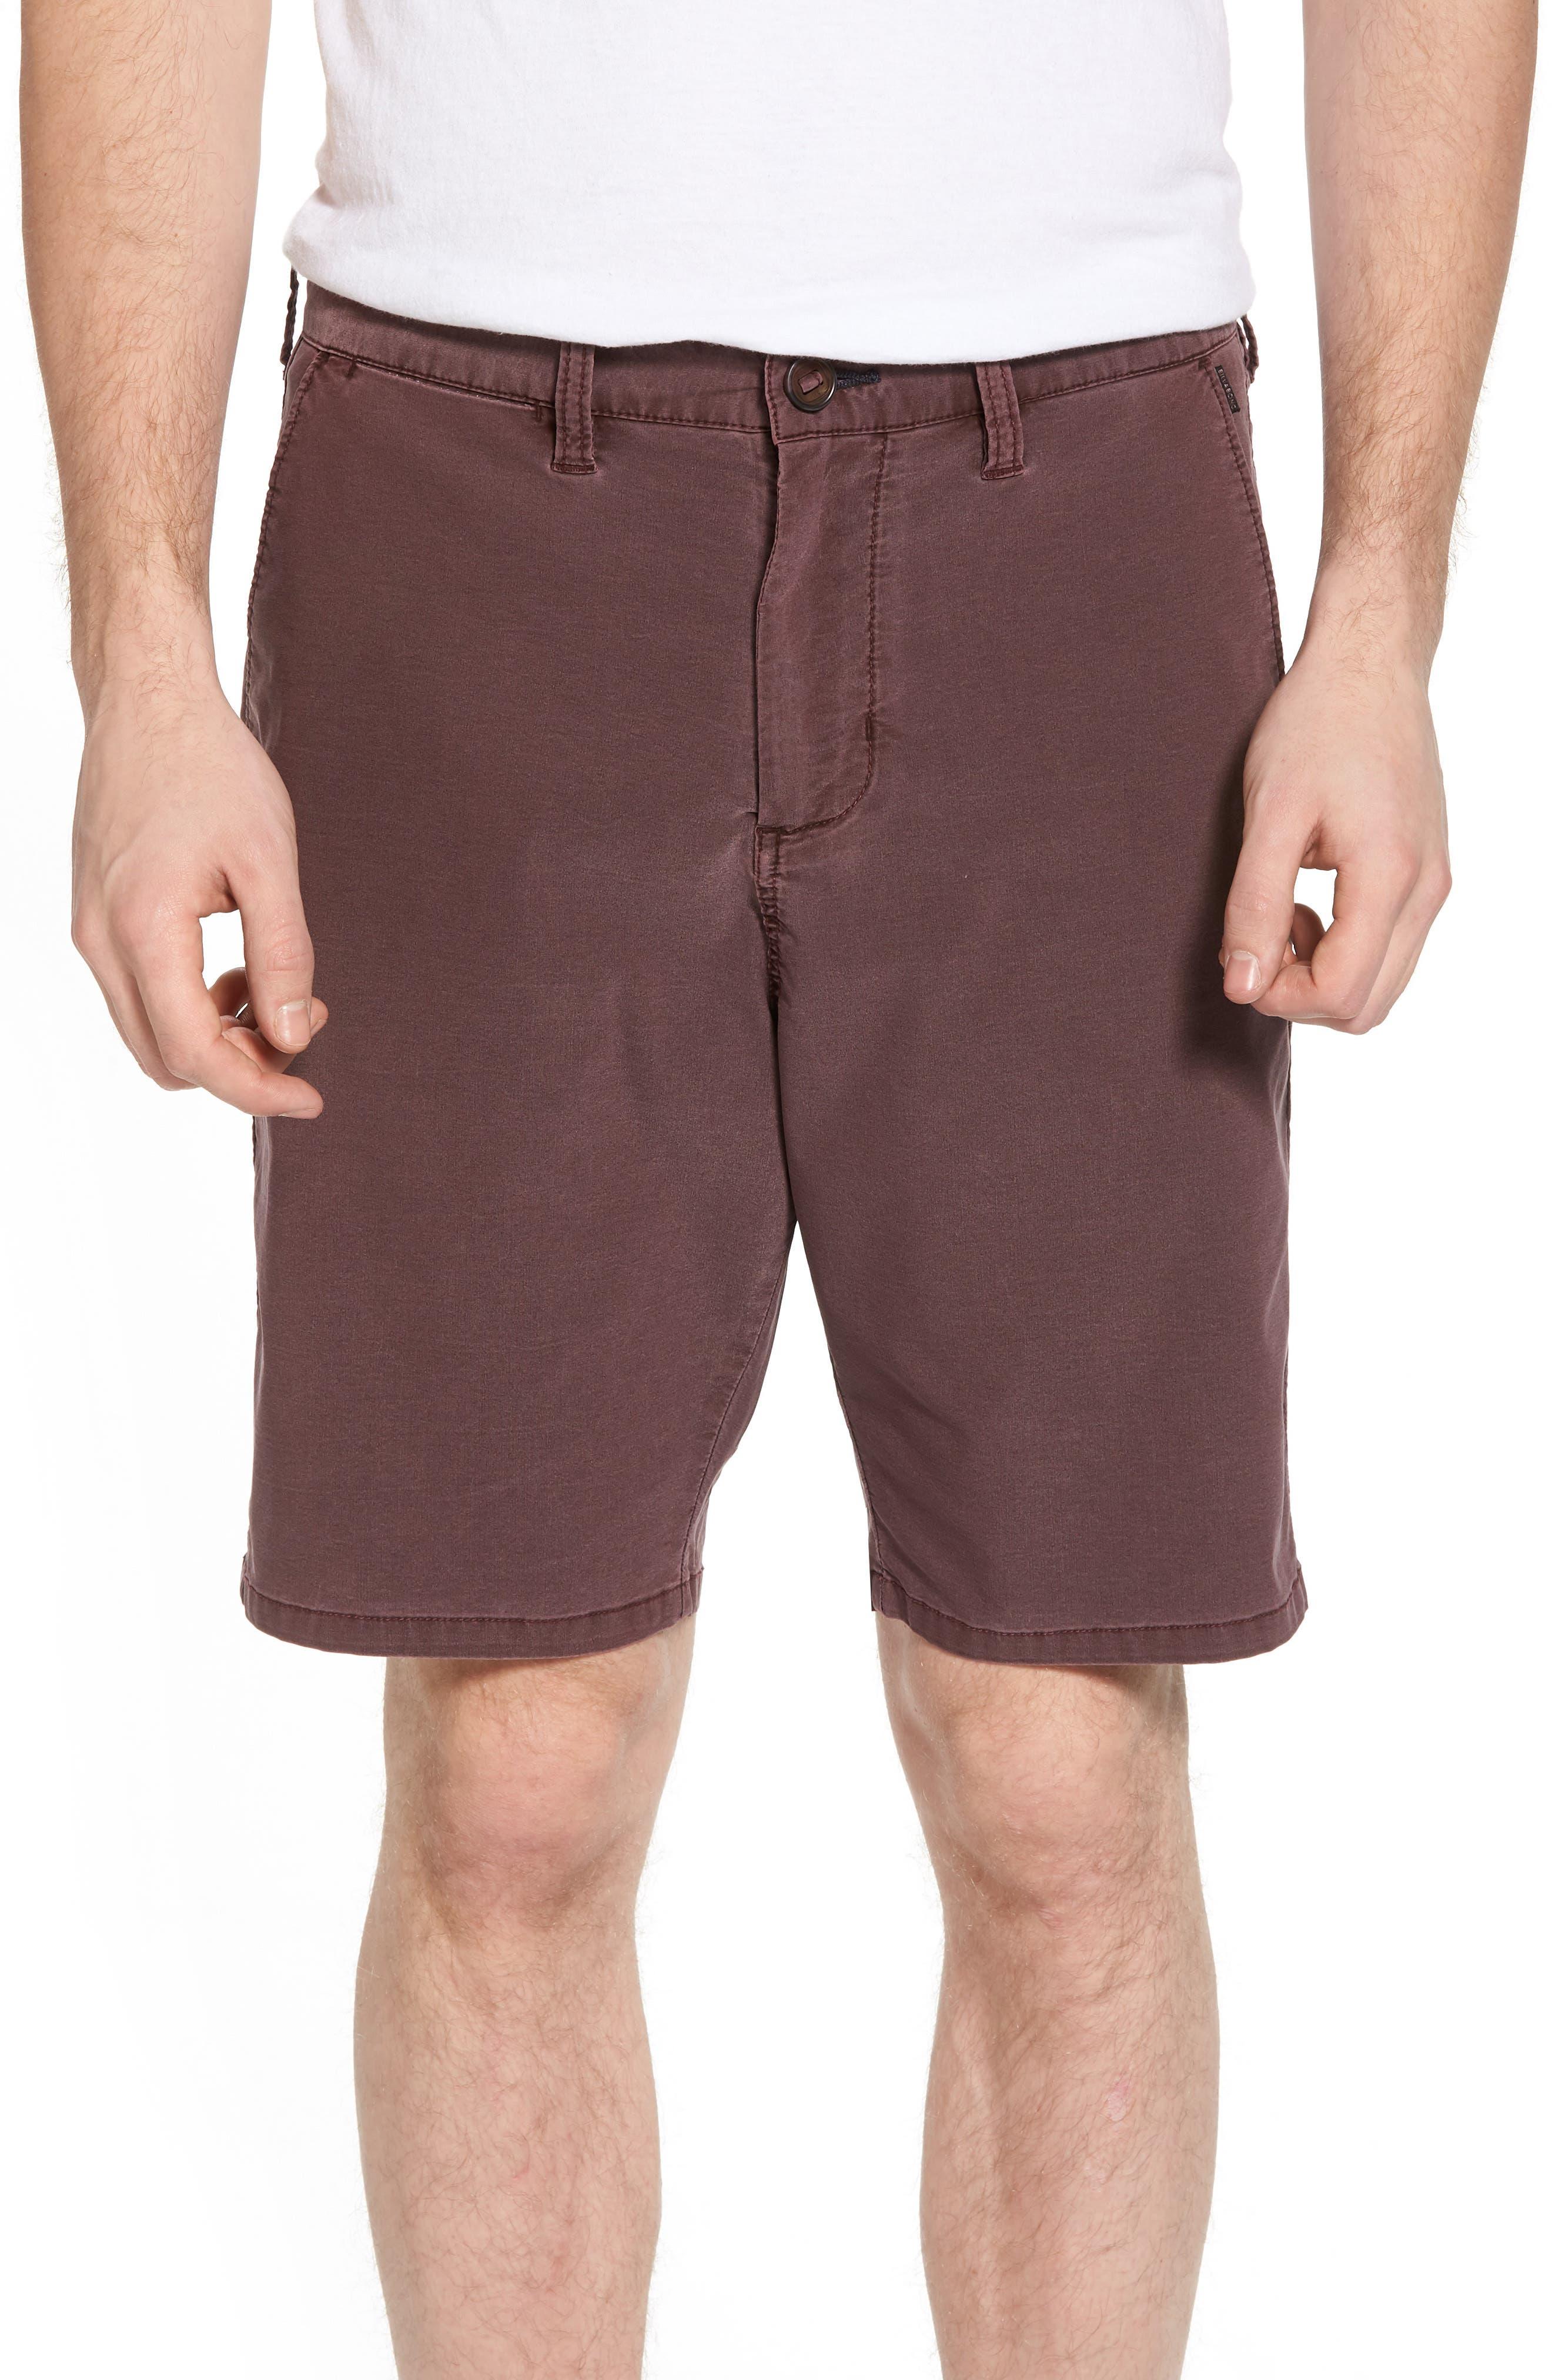 New Order X Overdye Hybrid Shorts,                             Main thumbnail 1, color,                             Rum